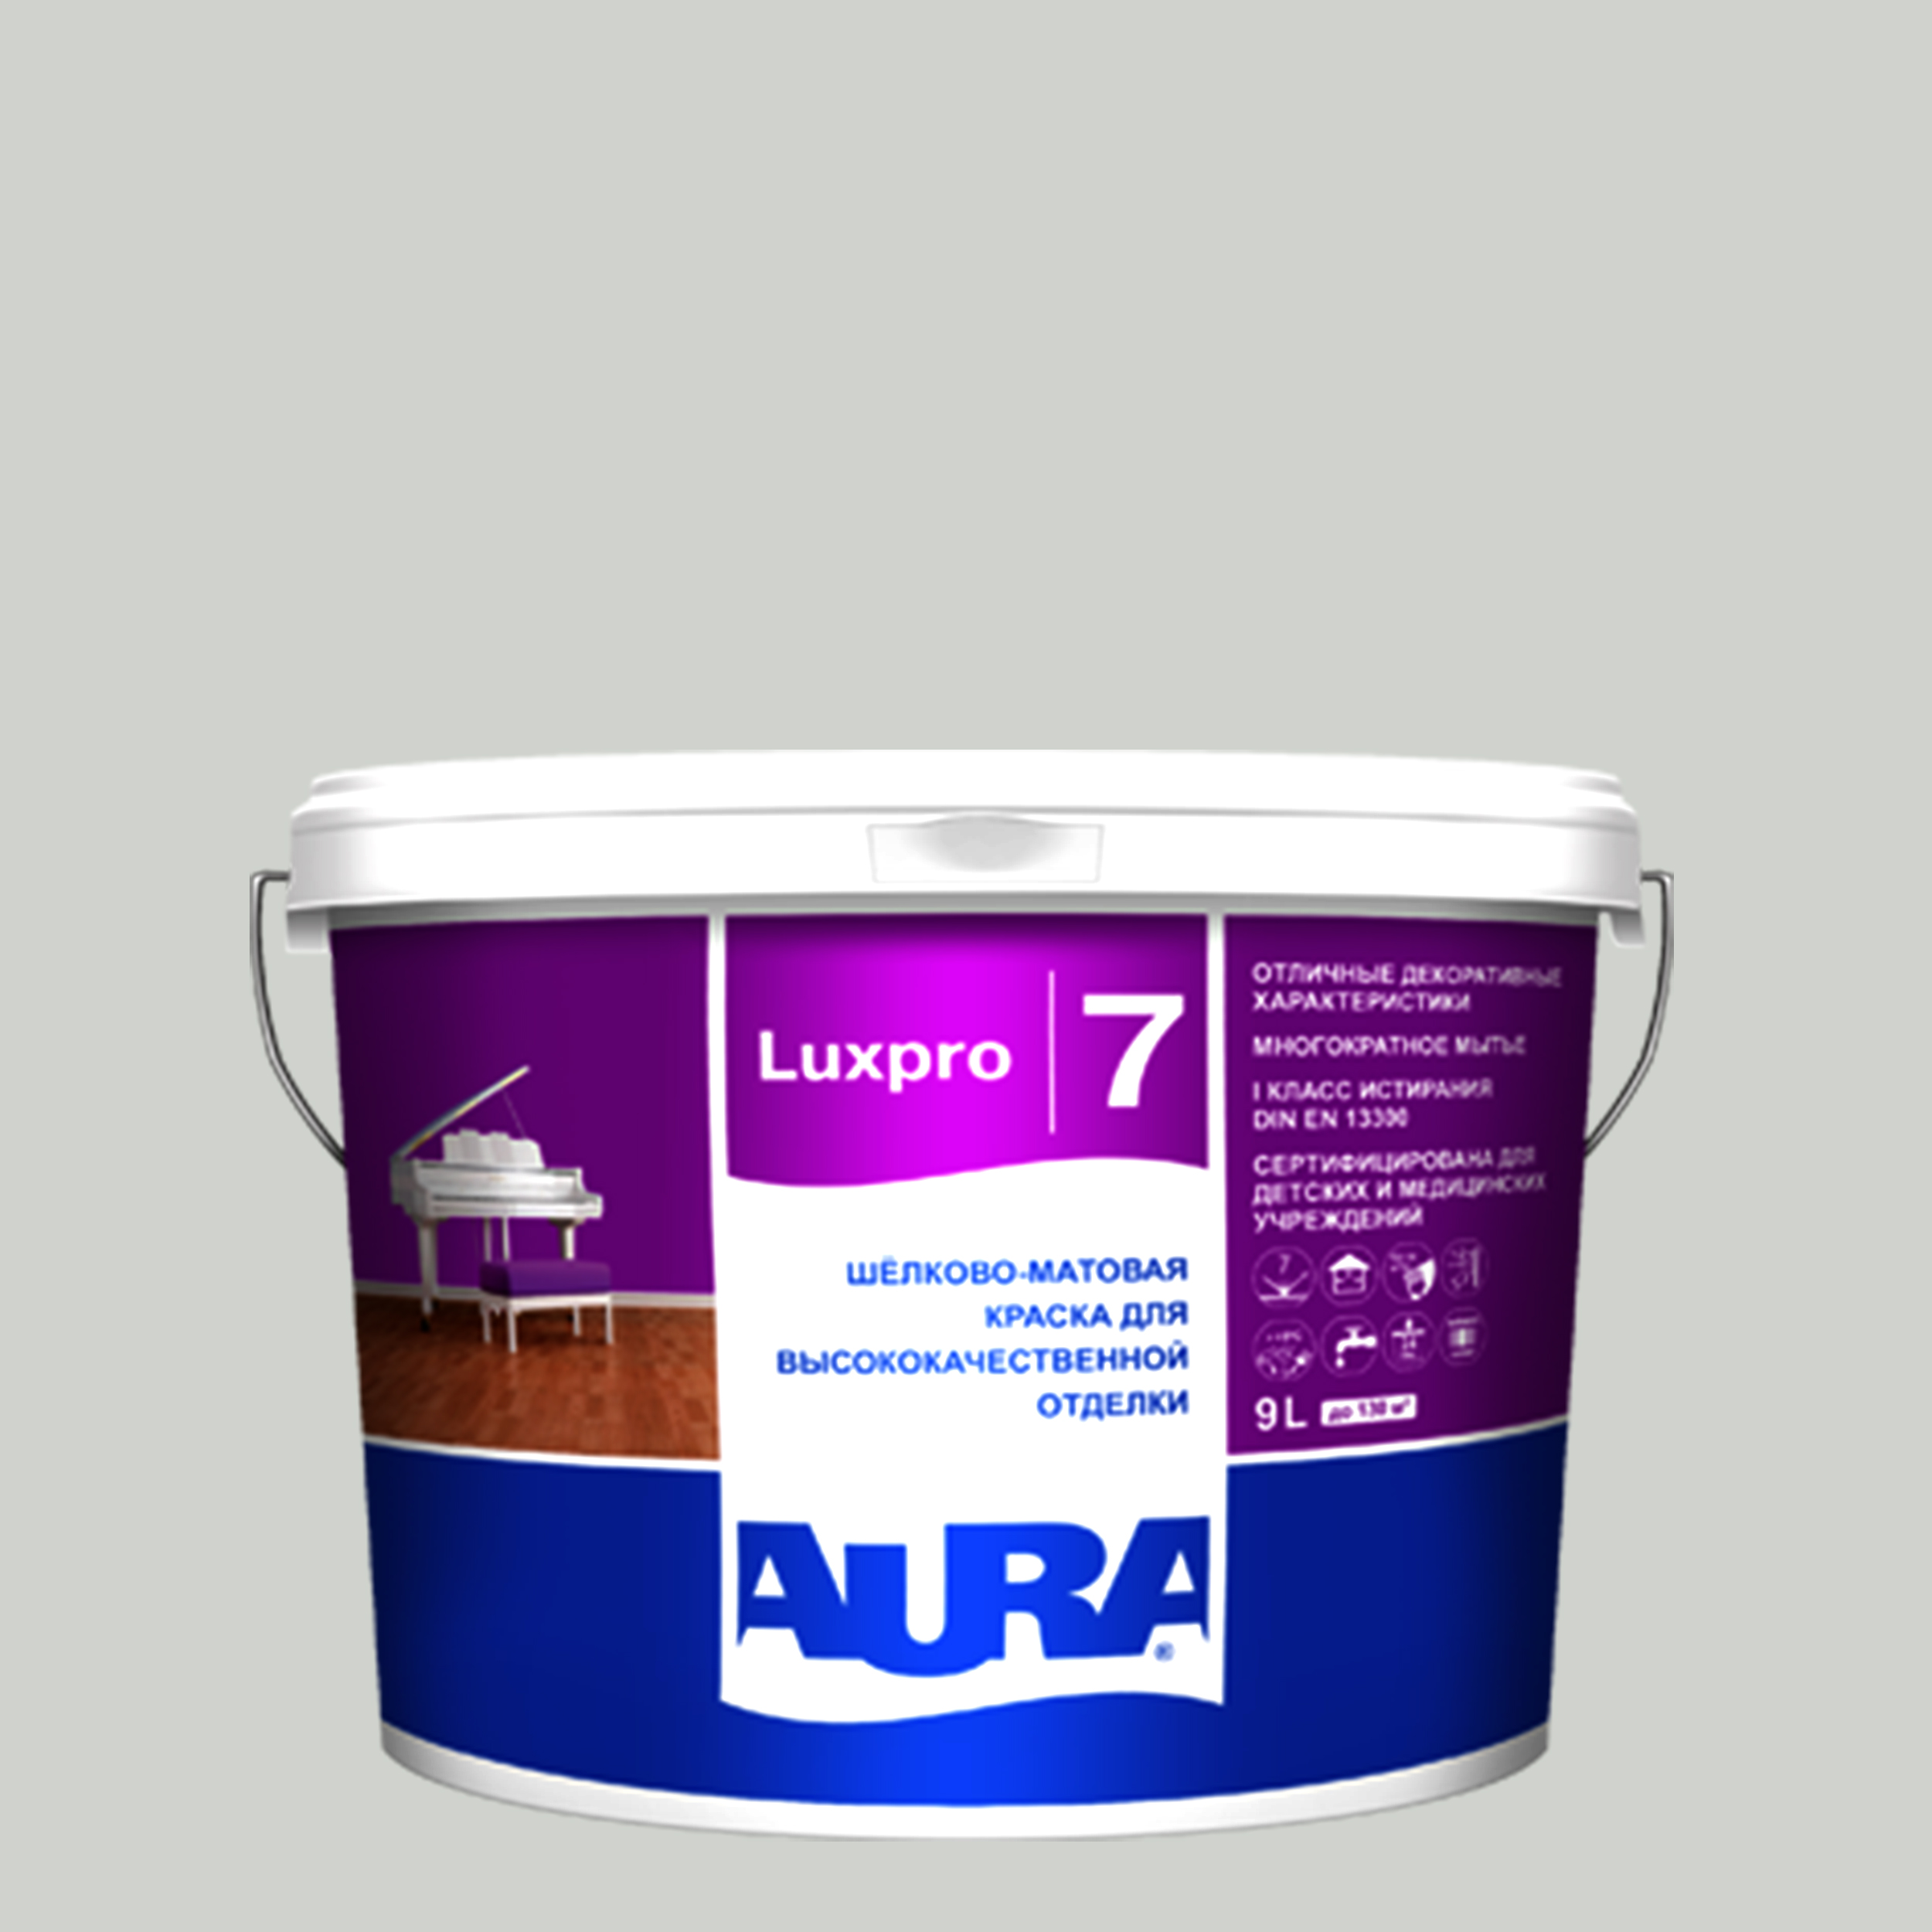 Фото 4 - Краска интерьерная, Aura LuxPRO 7, RAL 7008, 11 кг.